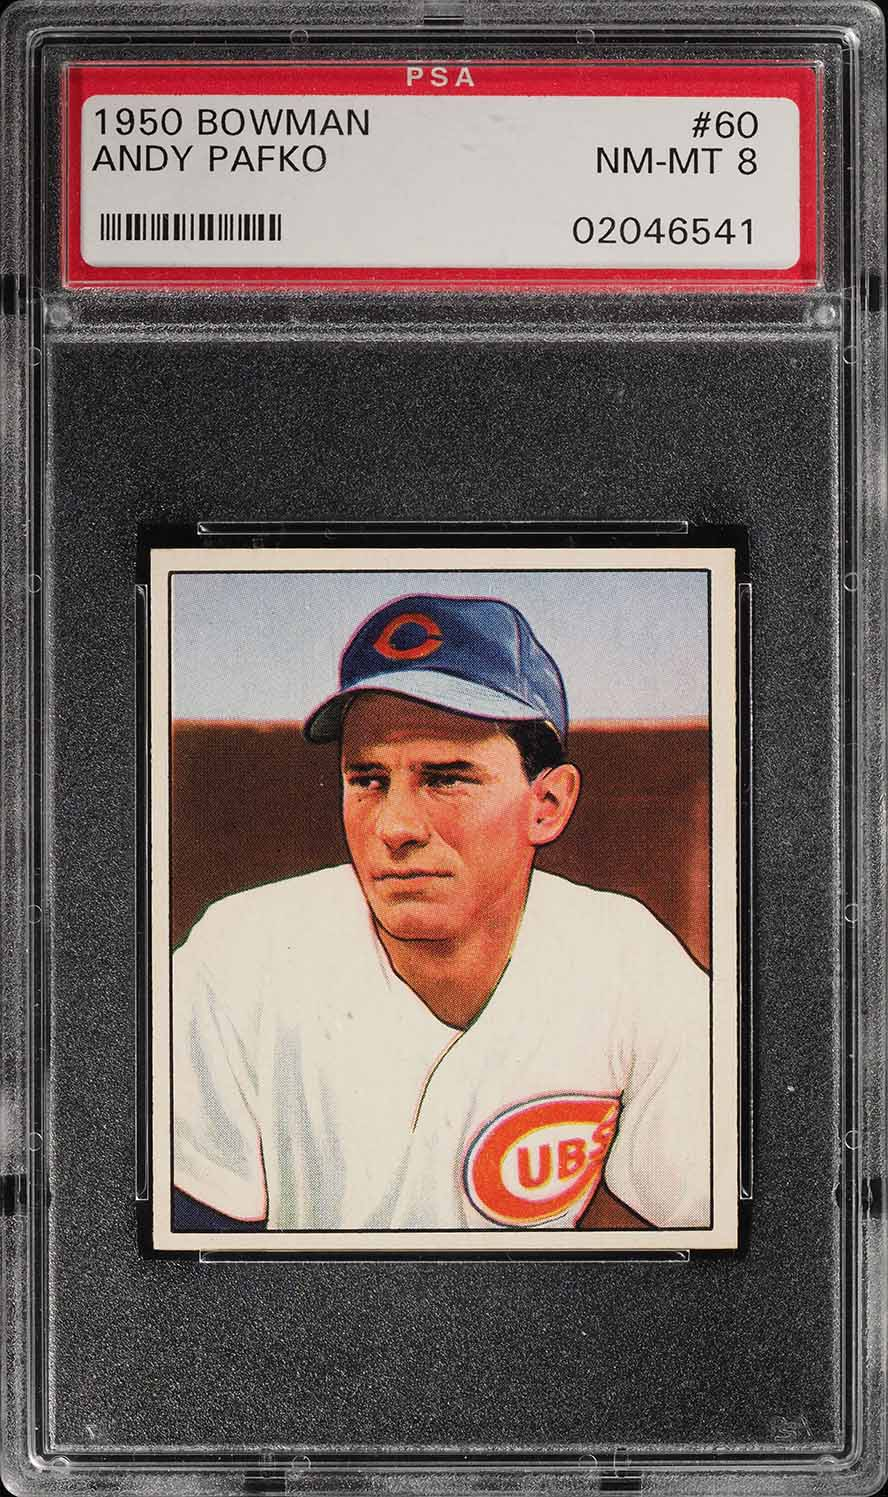 1950 Bowman Andy Pafko #60 PSA 8 NM-MT (PWCC) - Image 1